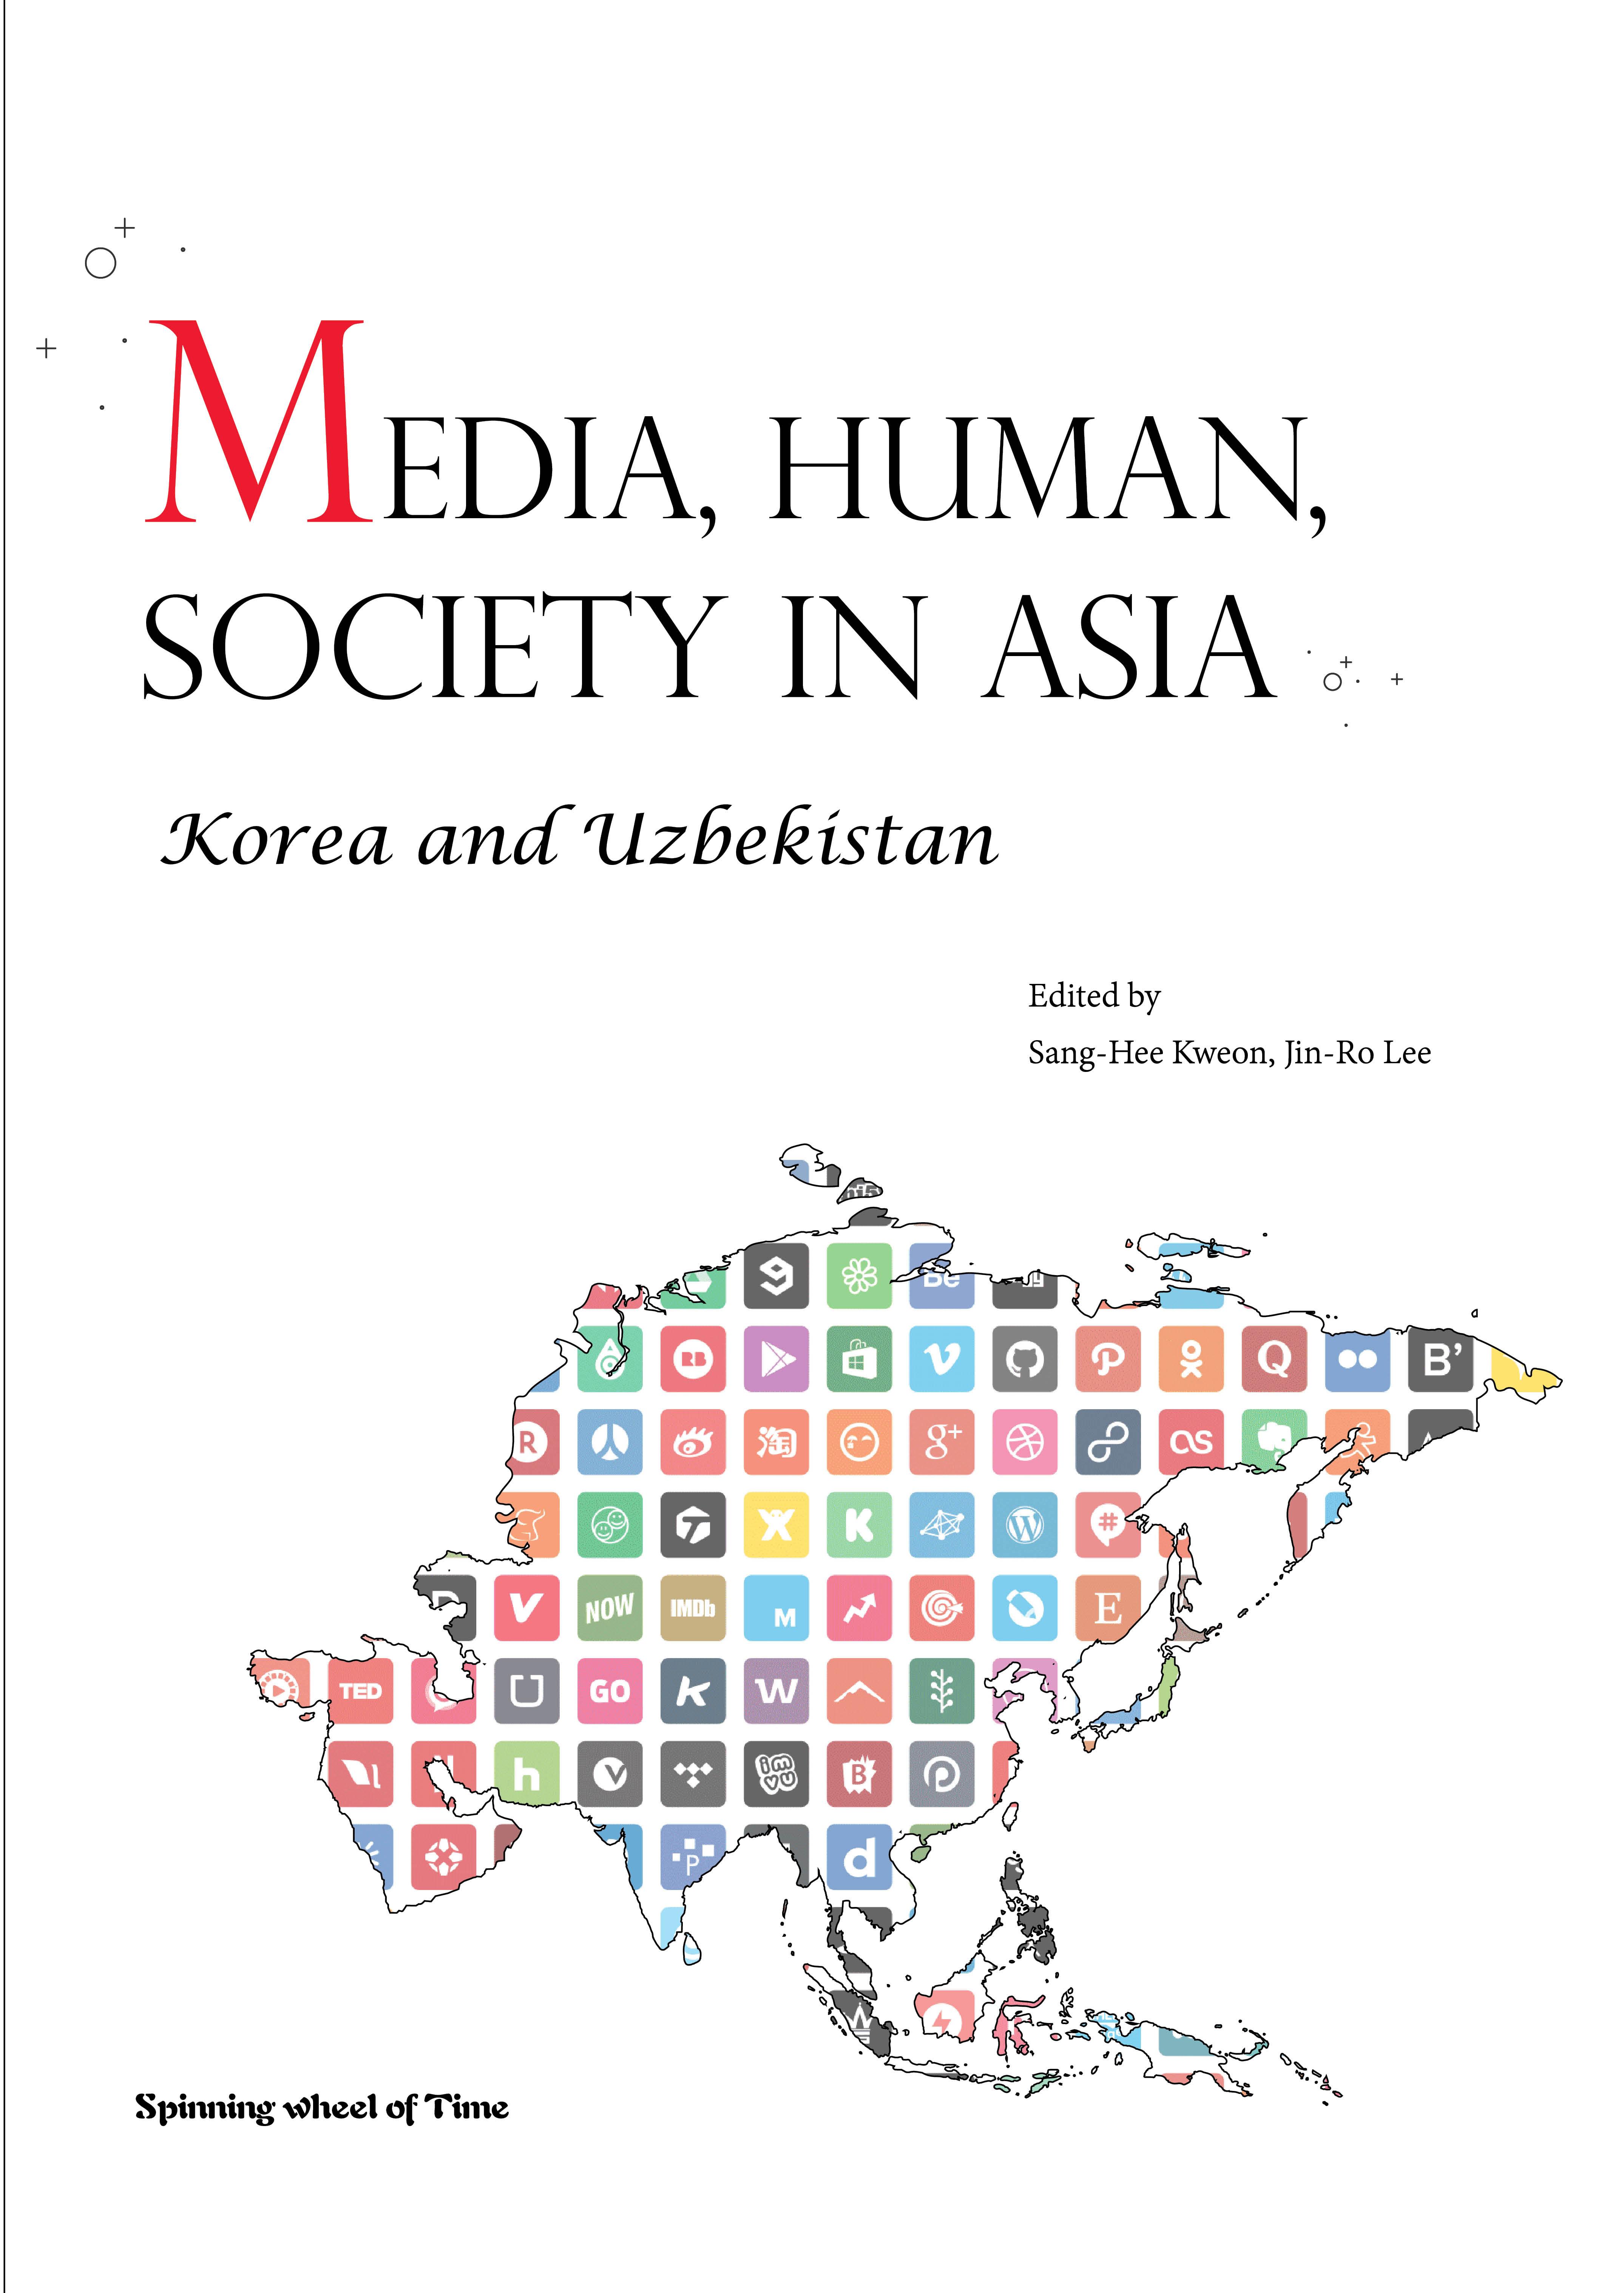 Media, Human, Society in Asia